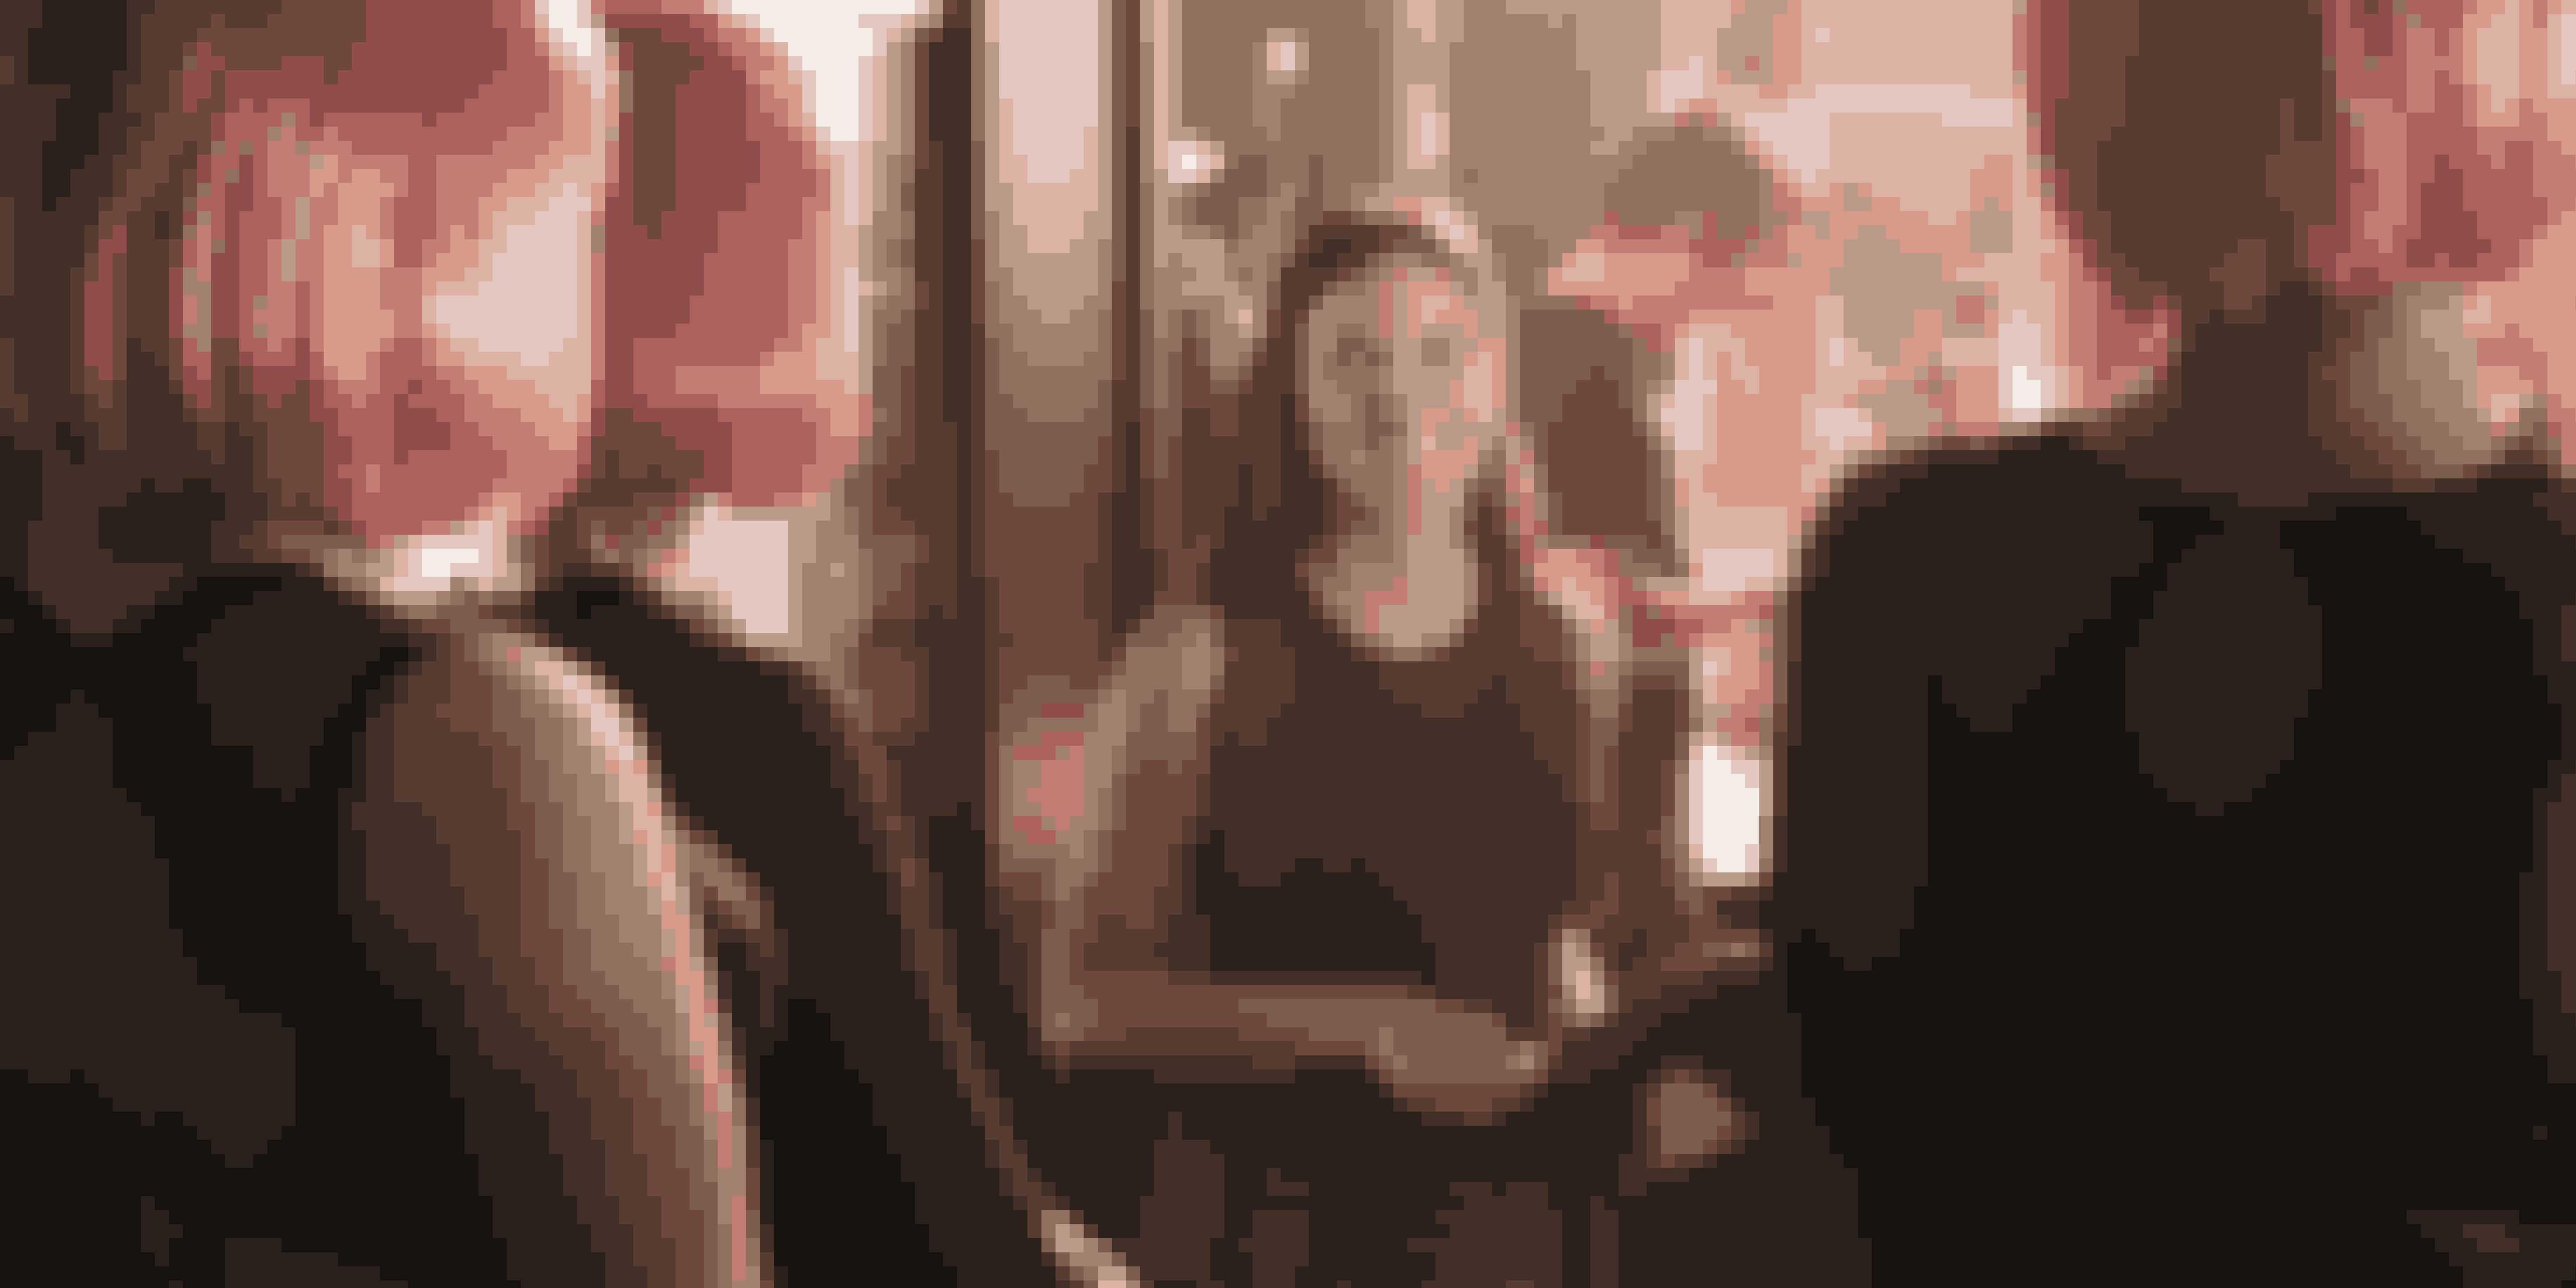 Fra 22. februar kan Jessica Chastain opleves i Aaron Sorkins debut som instruktør, i filmen 'Molly's Game'.